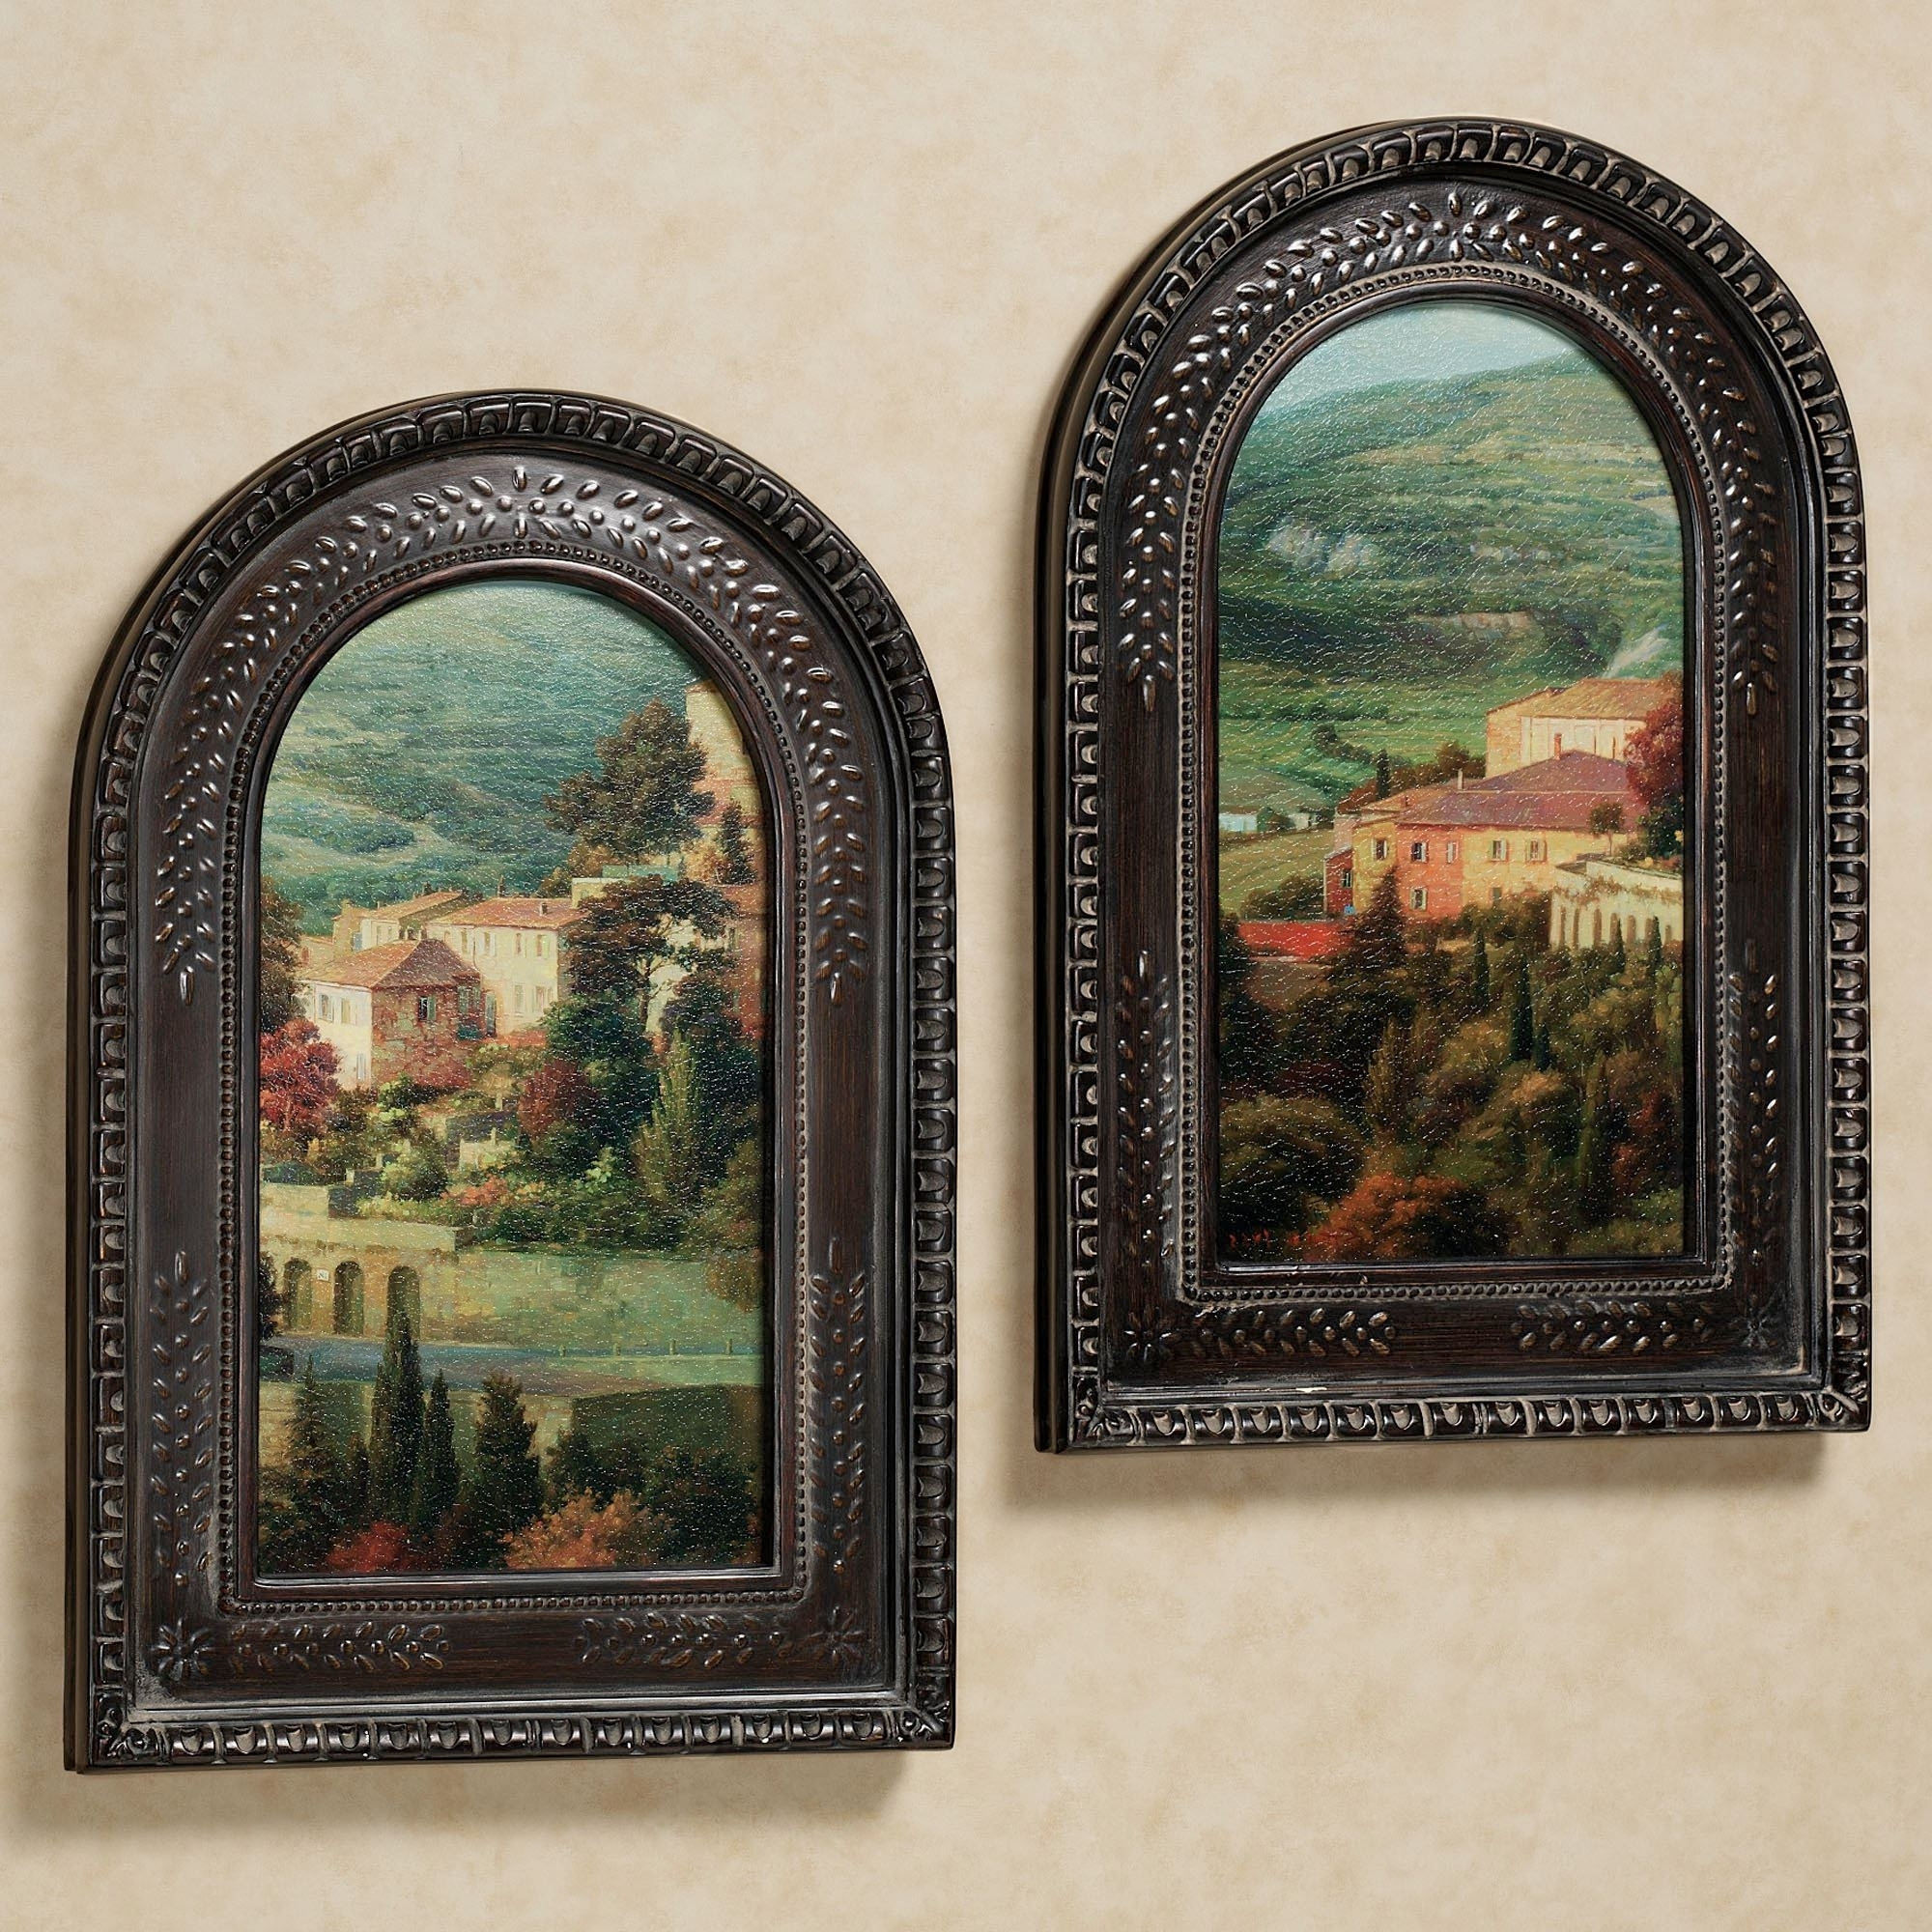 Italian Overlook Framed Wall Art Set Throughout Favorite Framed Wall Art (Gallery 4 of 15)